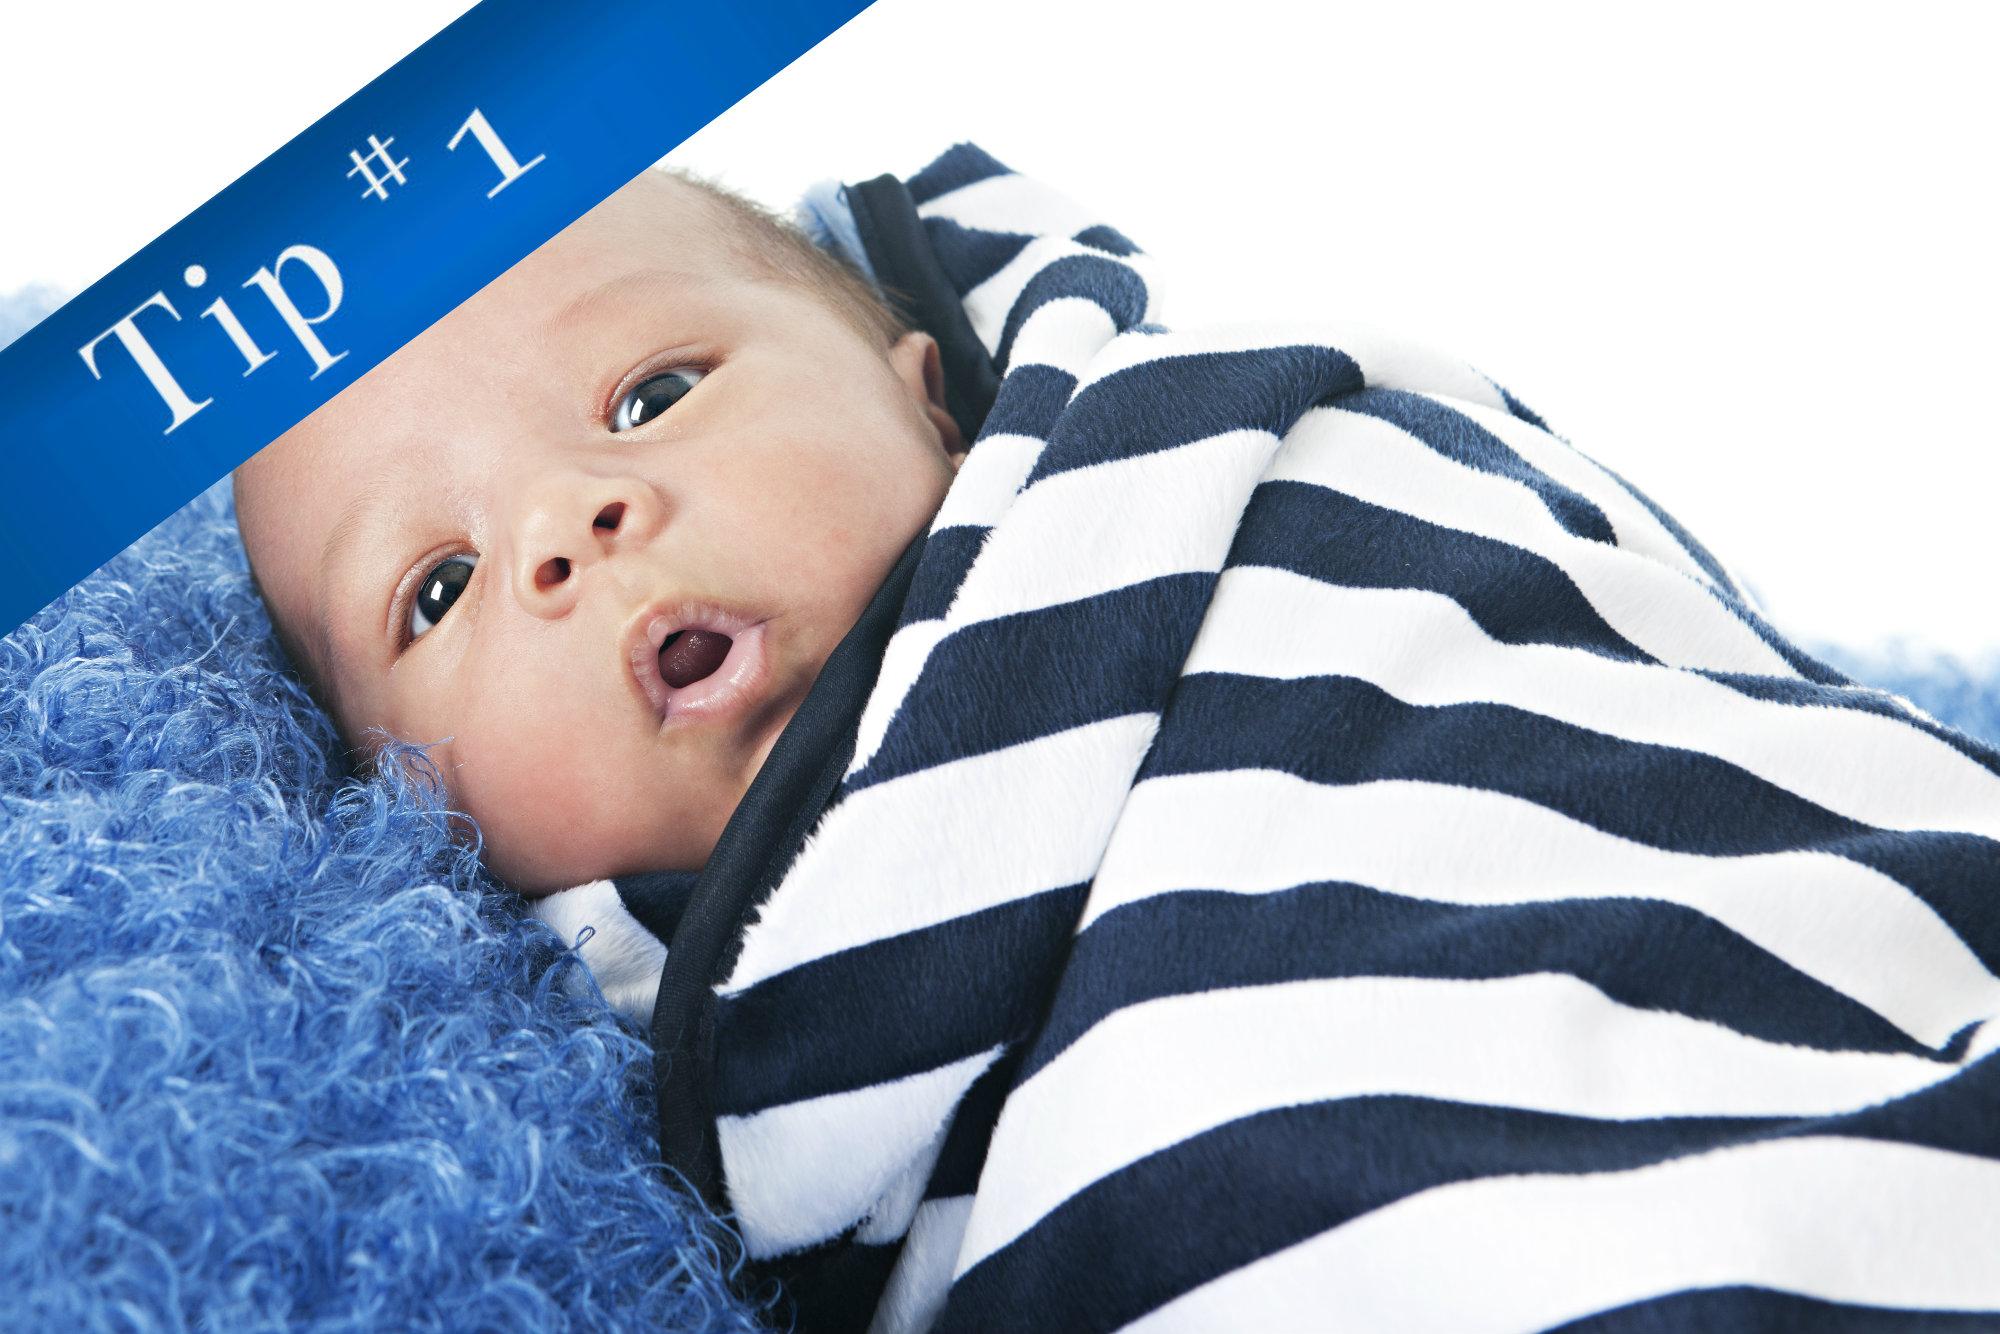 Newborns should get 14-17 hours of sleep per day.